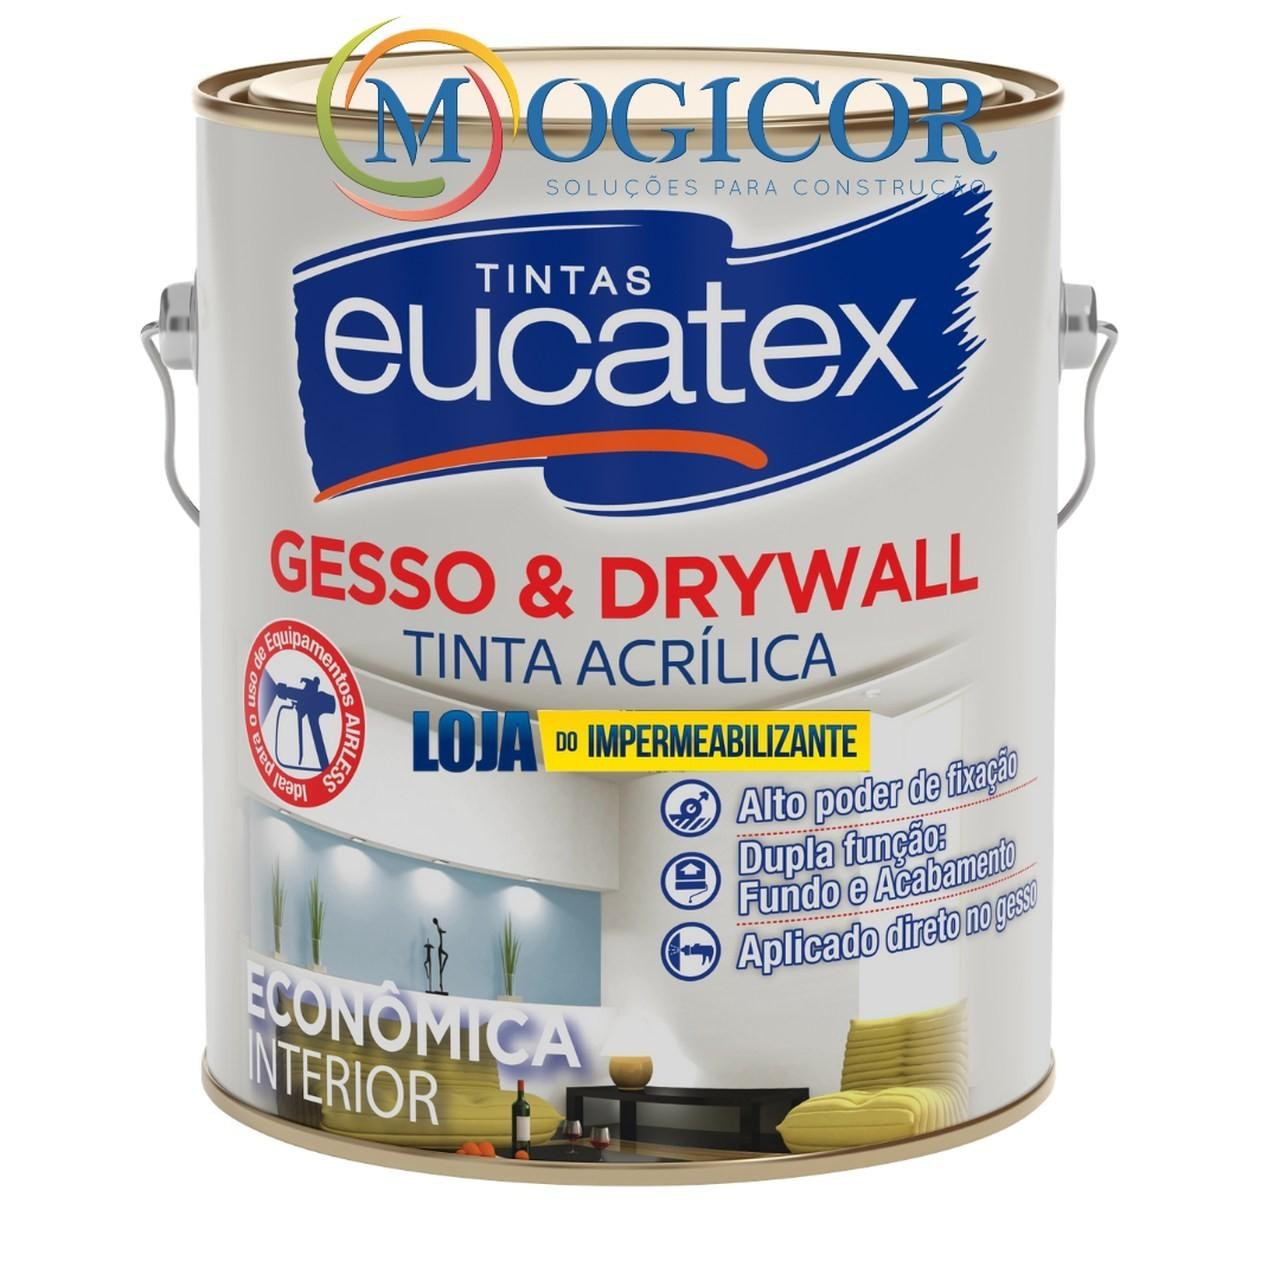 Tinta P/ Pintar Direto No Gesso E Drywall 3,6l Branca - Eucatex